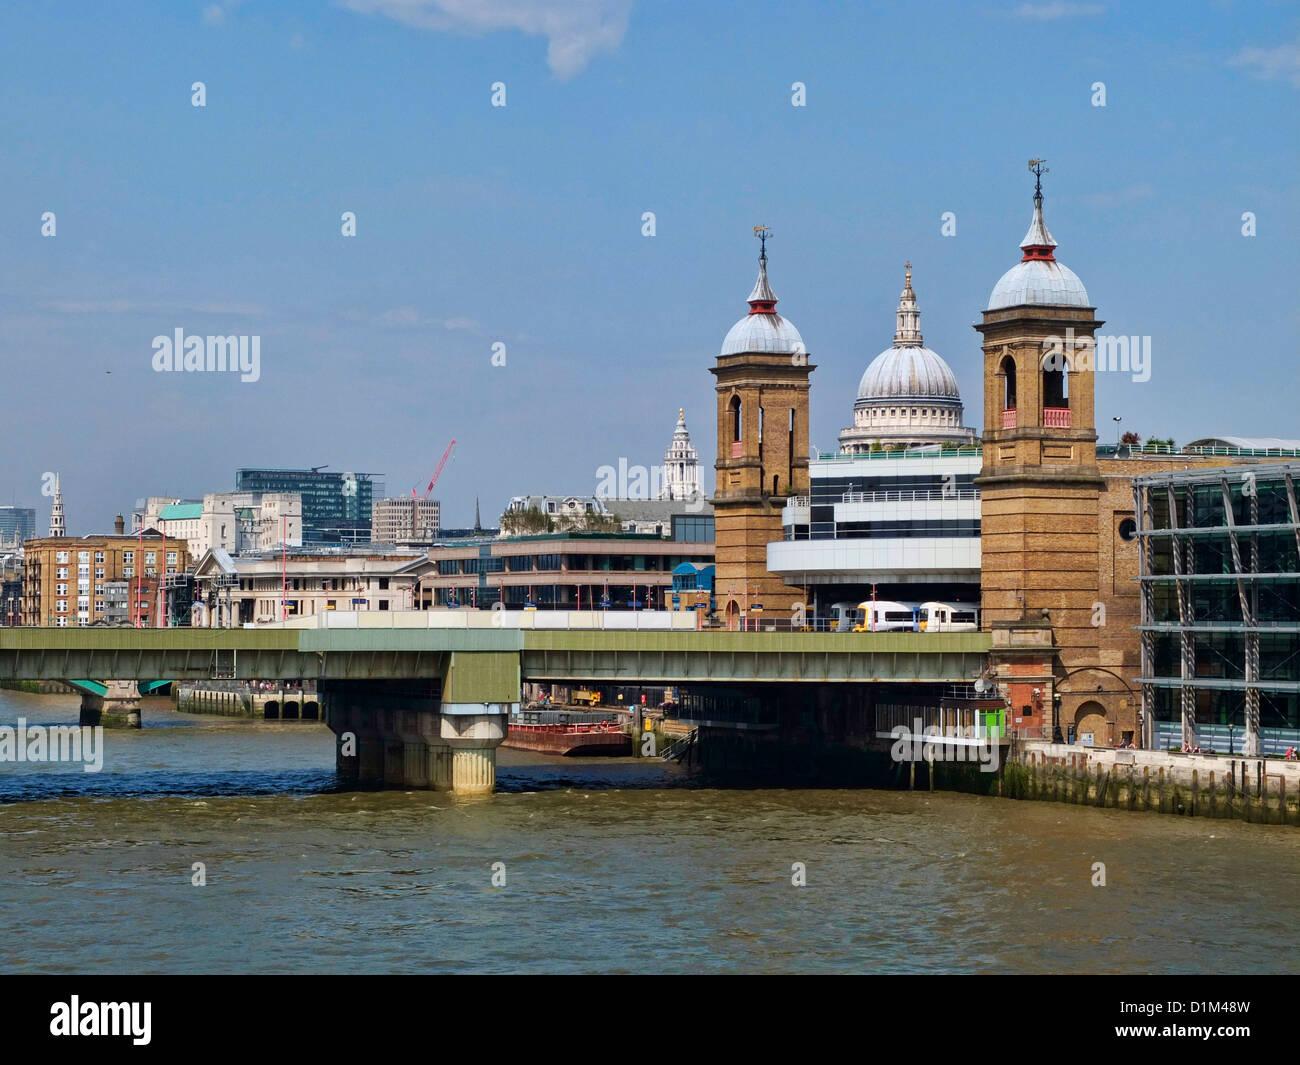 Cannon Street Railway Station and Cannon Street Railway Bridge, London, England, UK - Stock Image